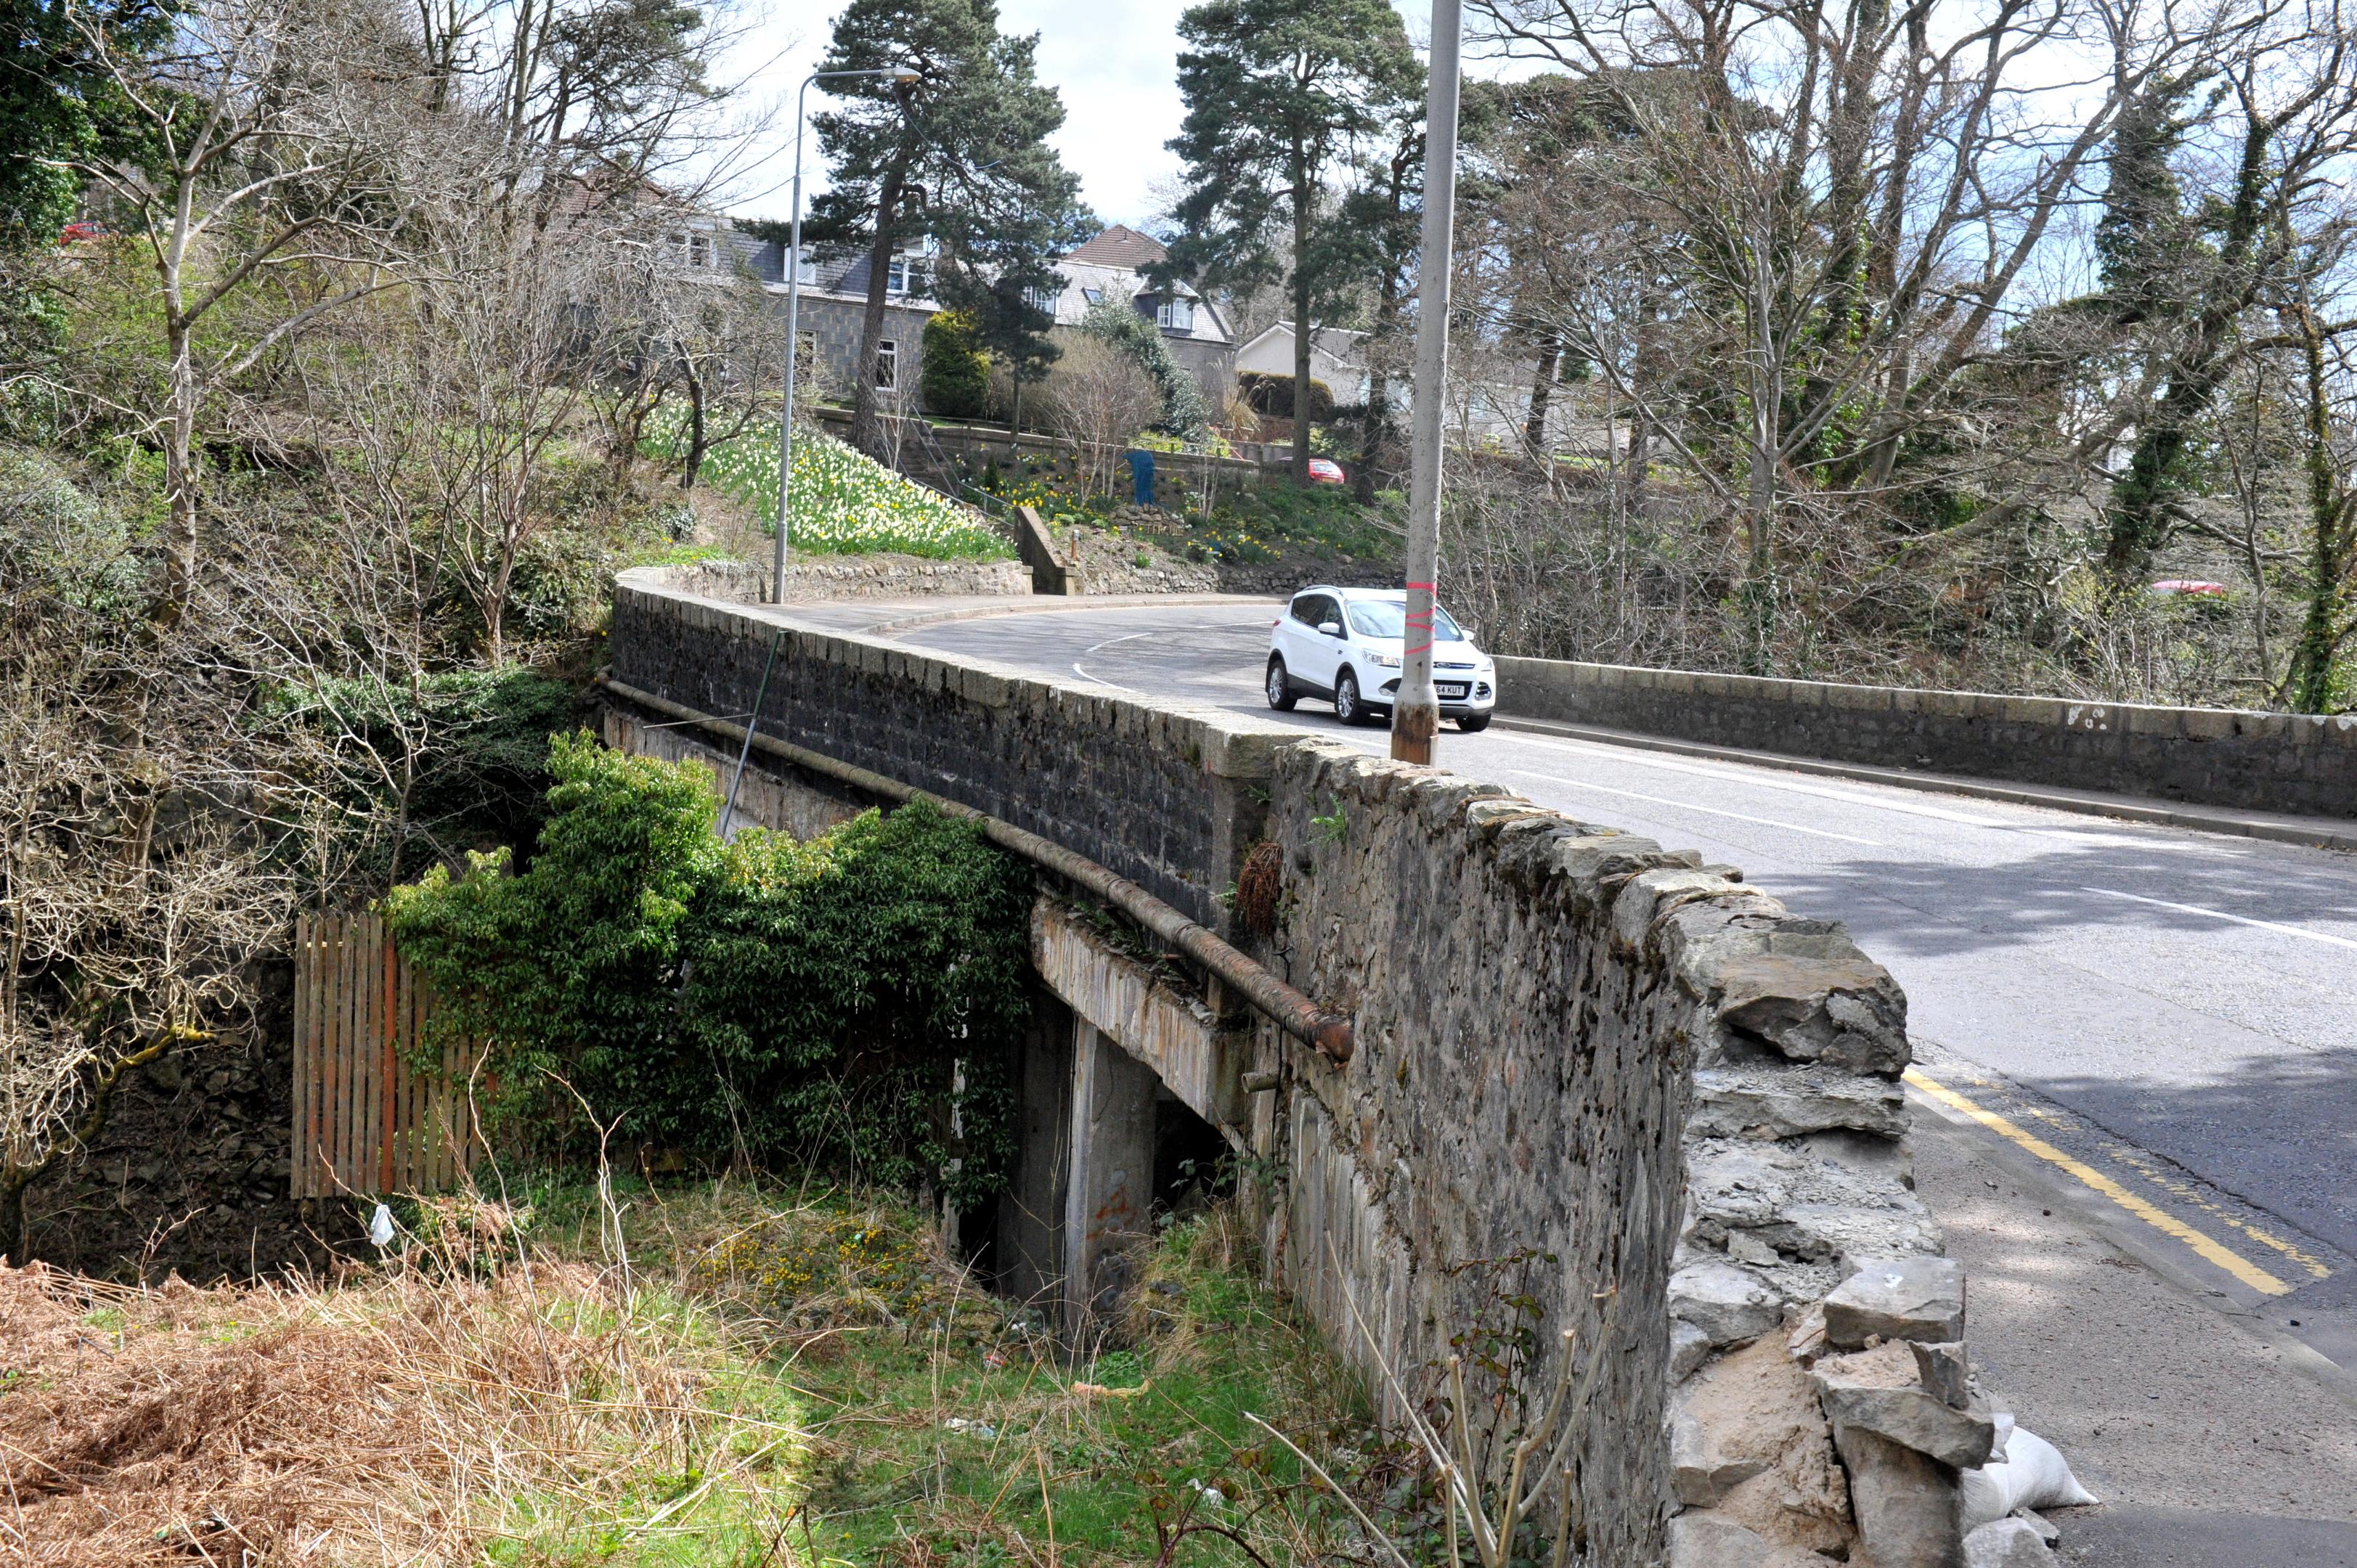 The Rob Roy Bridge at Peterculter is in need of repair.